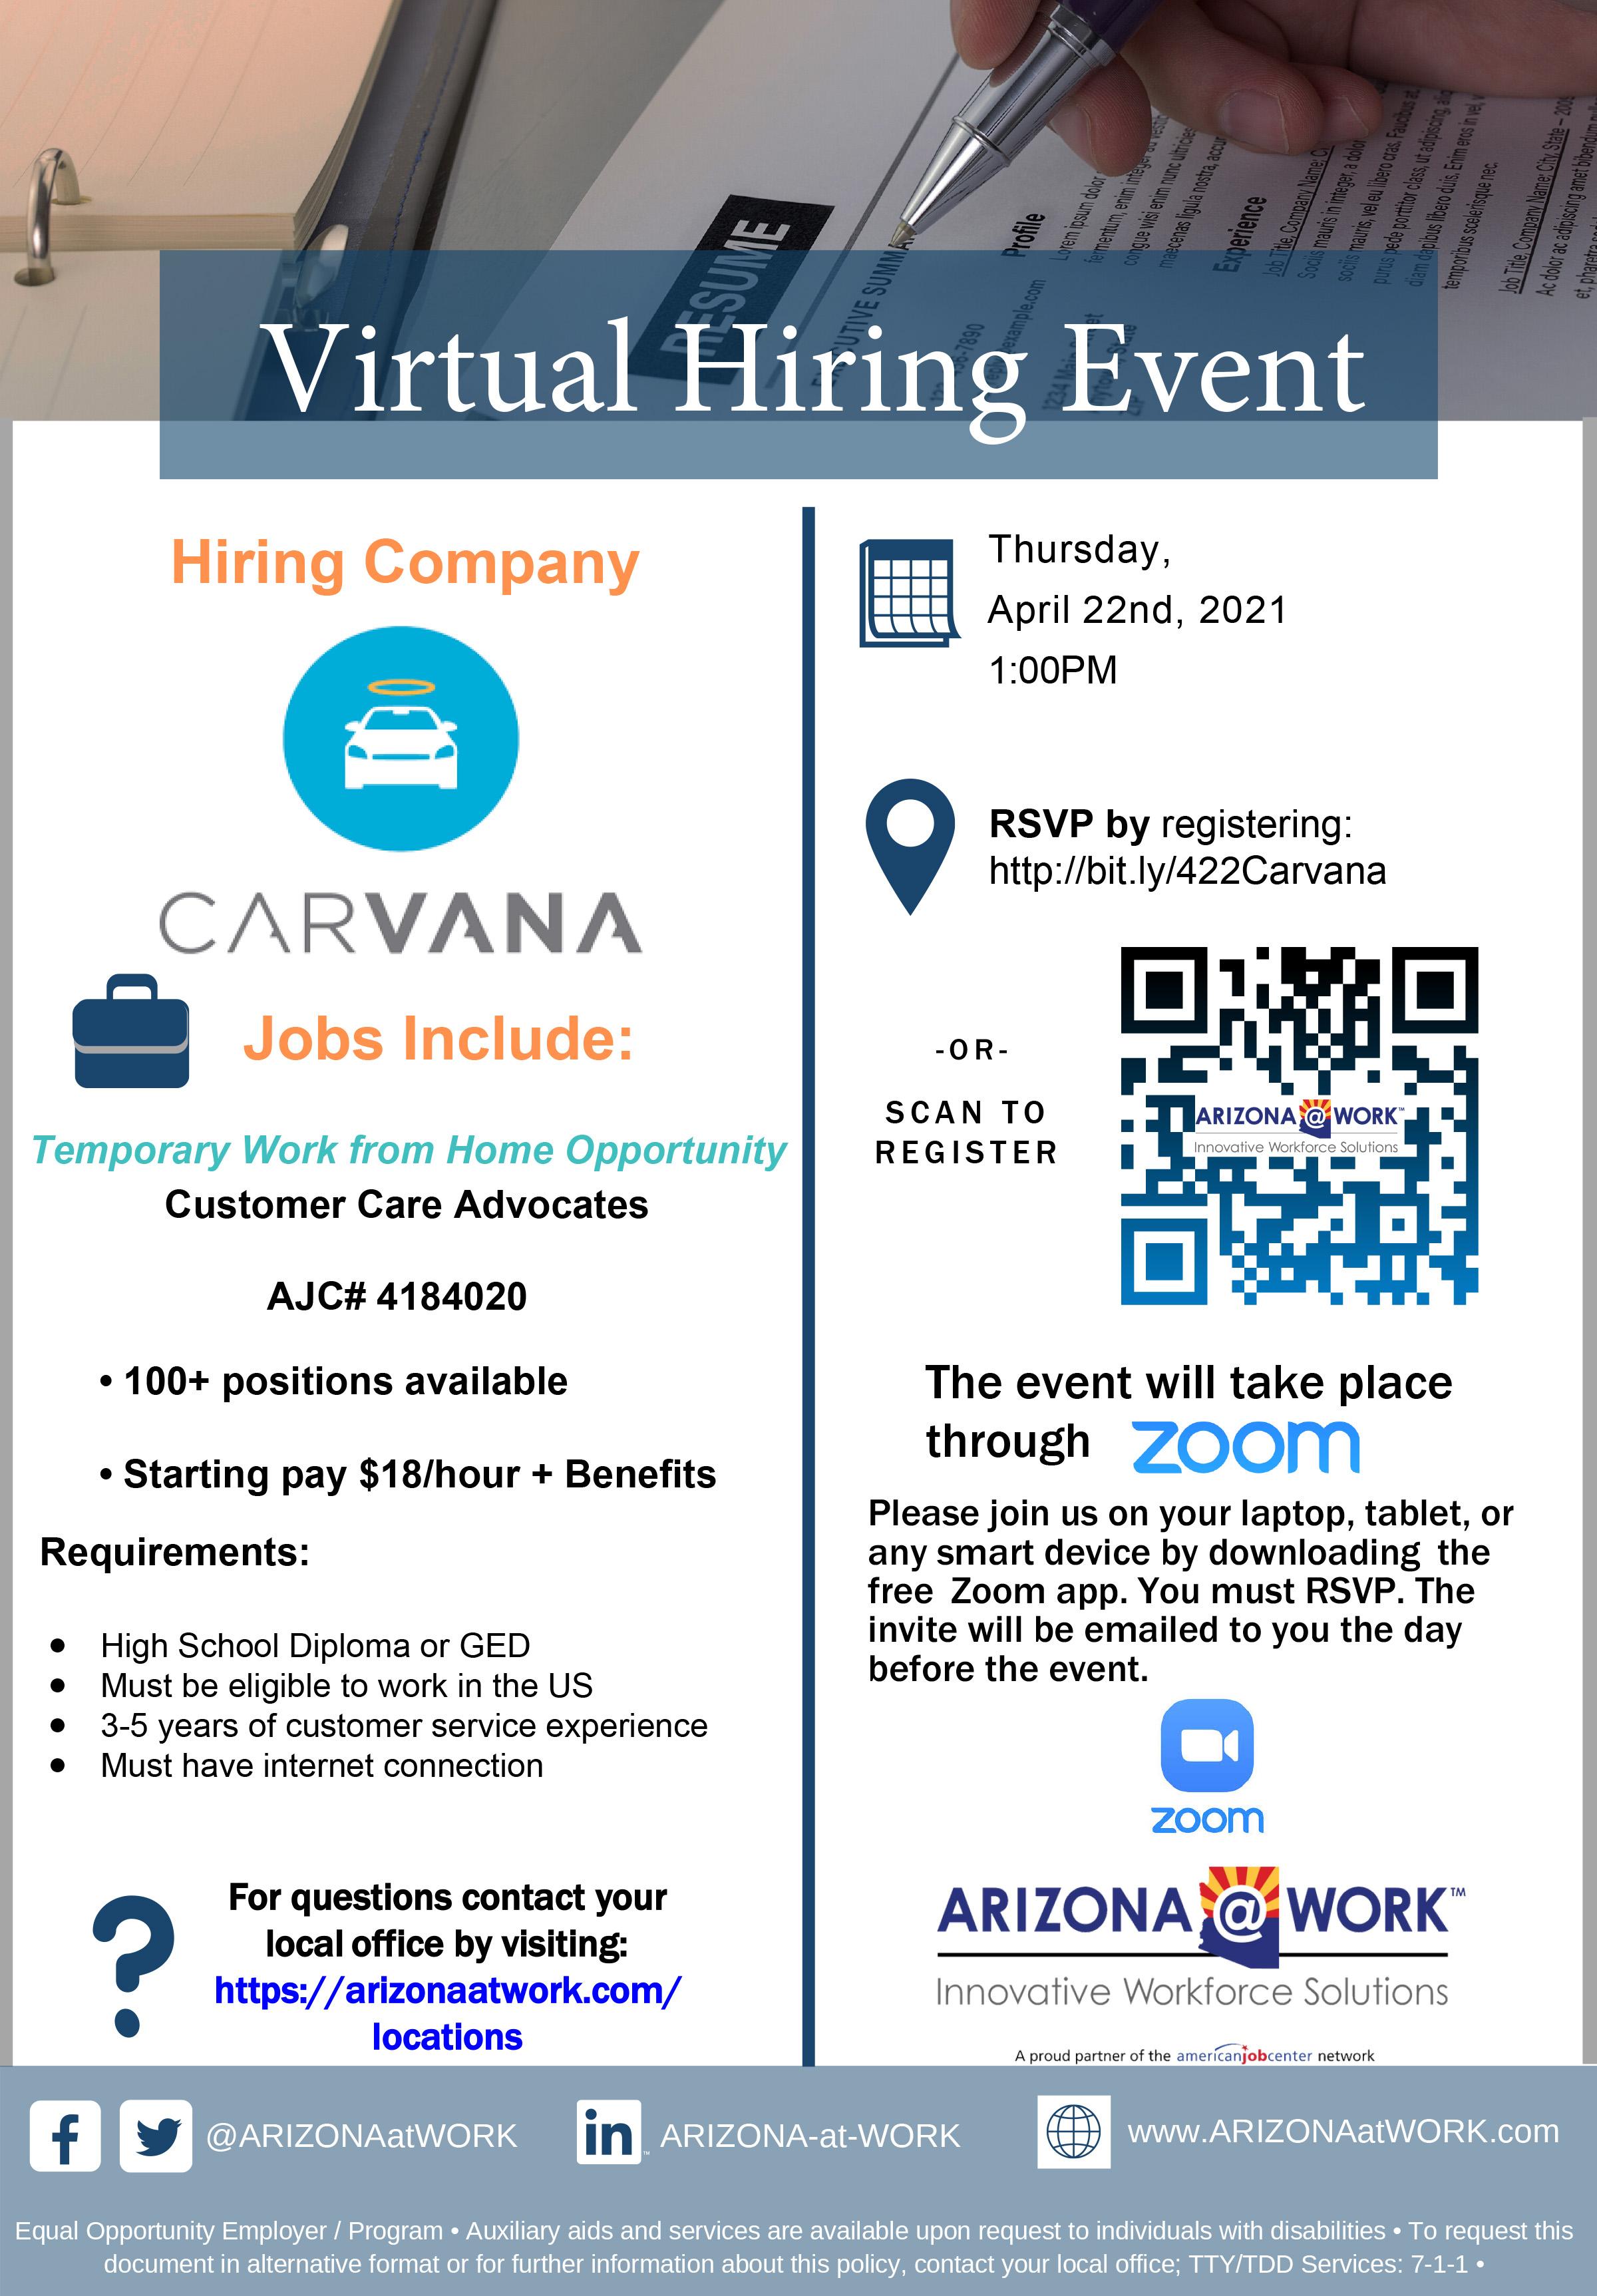 Carvana Virtual Hiring Event